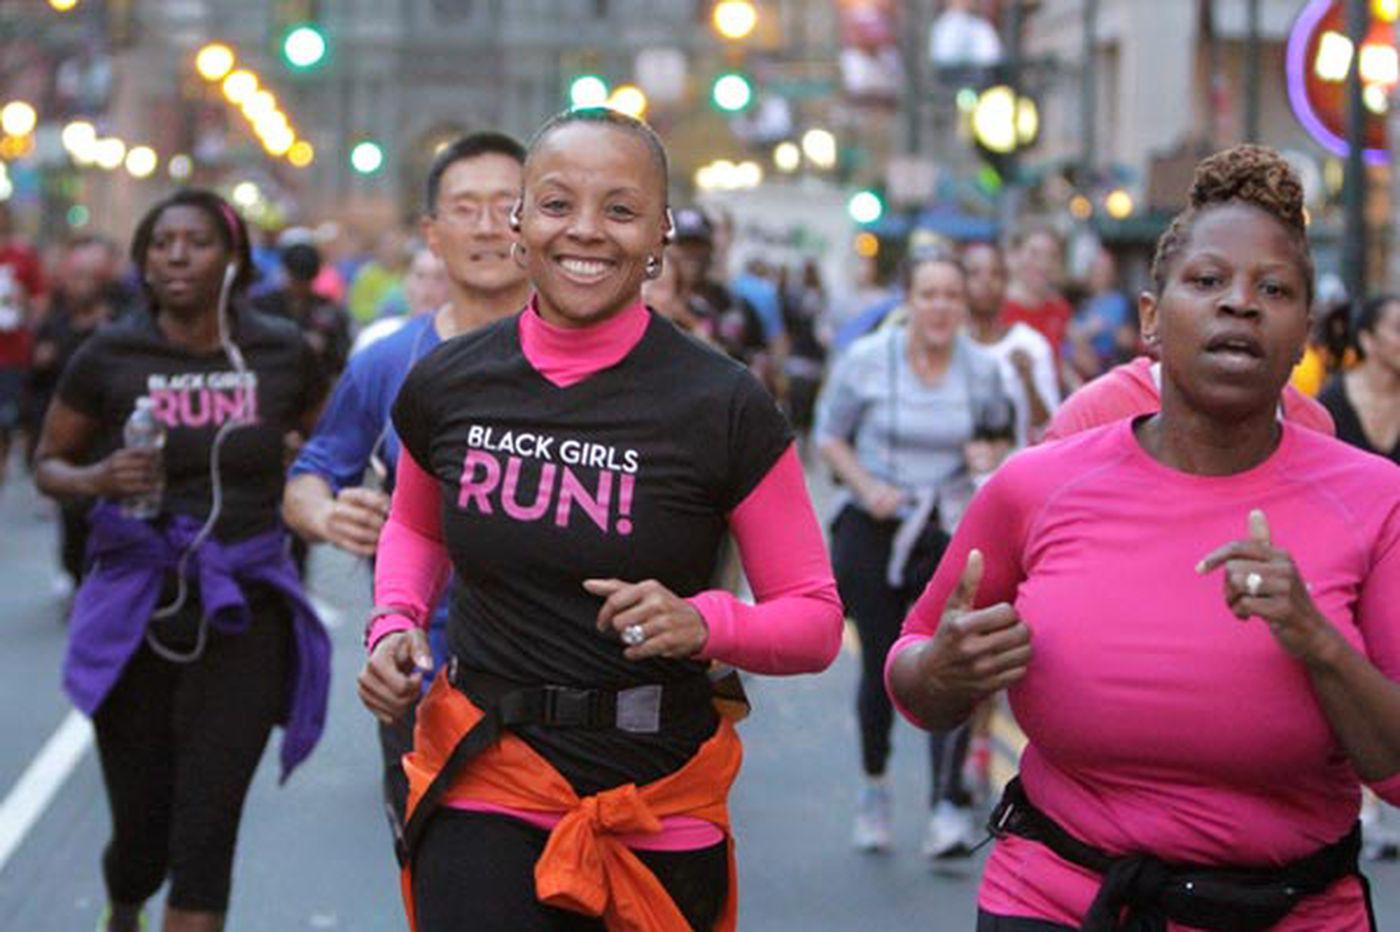 'Black Girls' running group combats obesity, myths